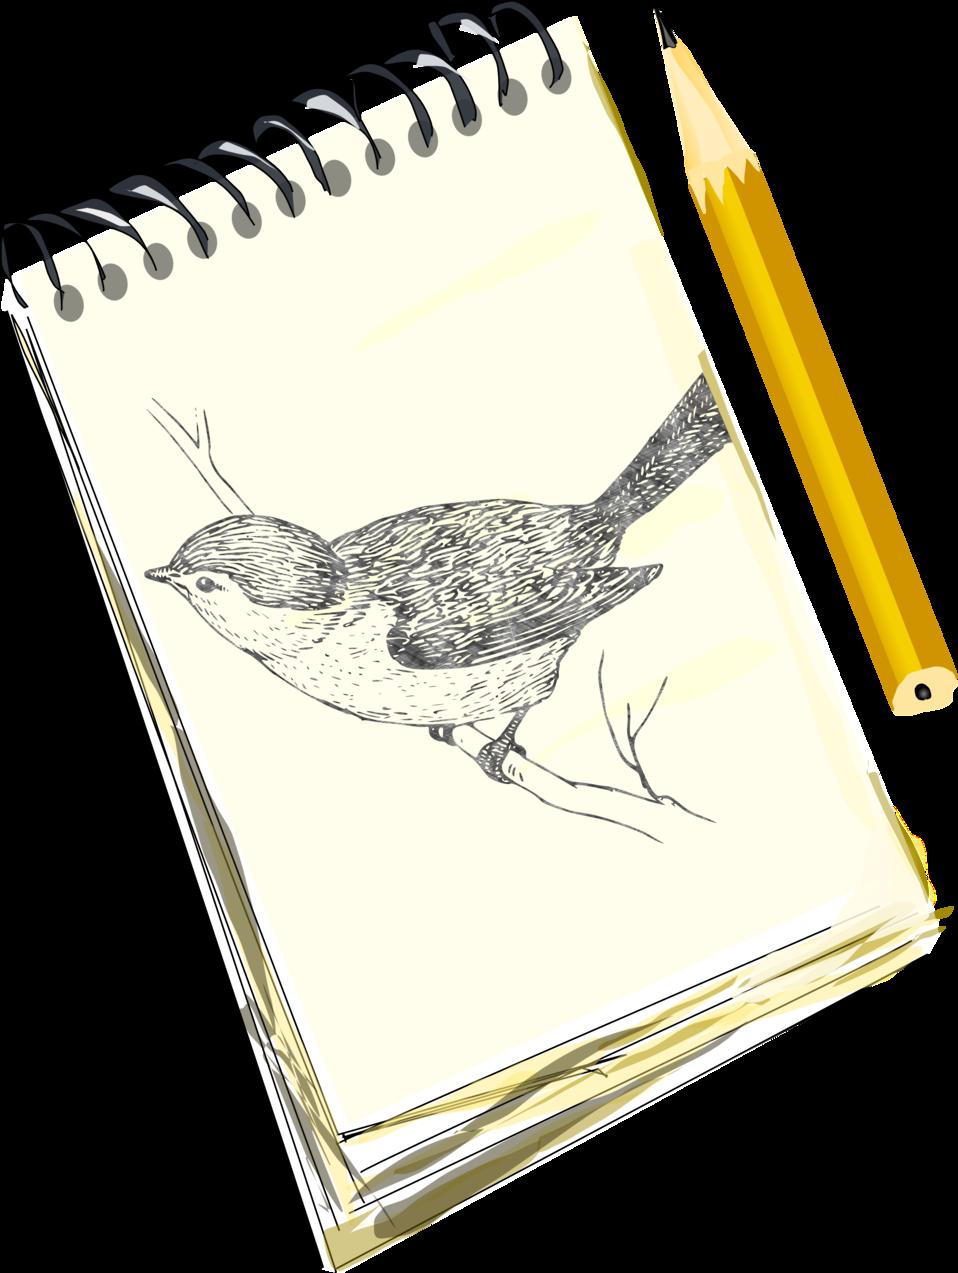 Draw clipart sketch artist. Public domain clip art